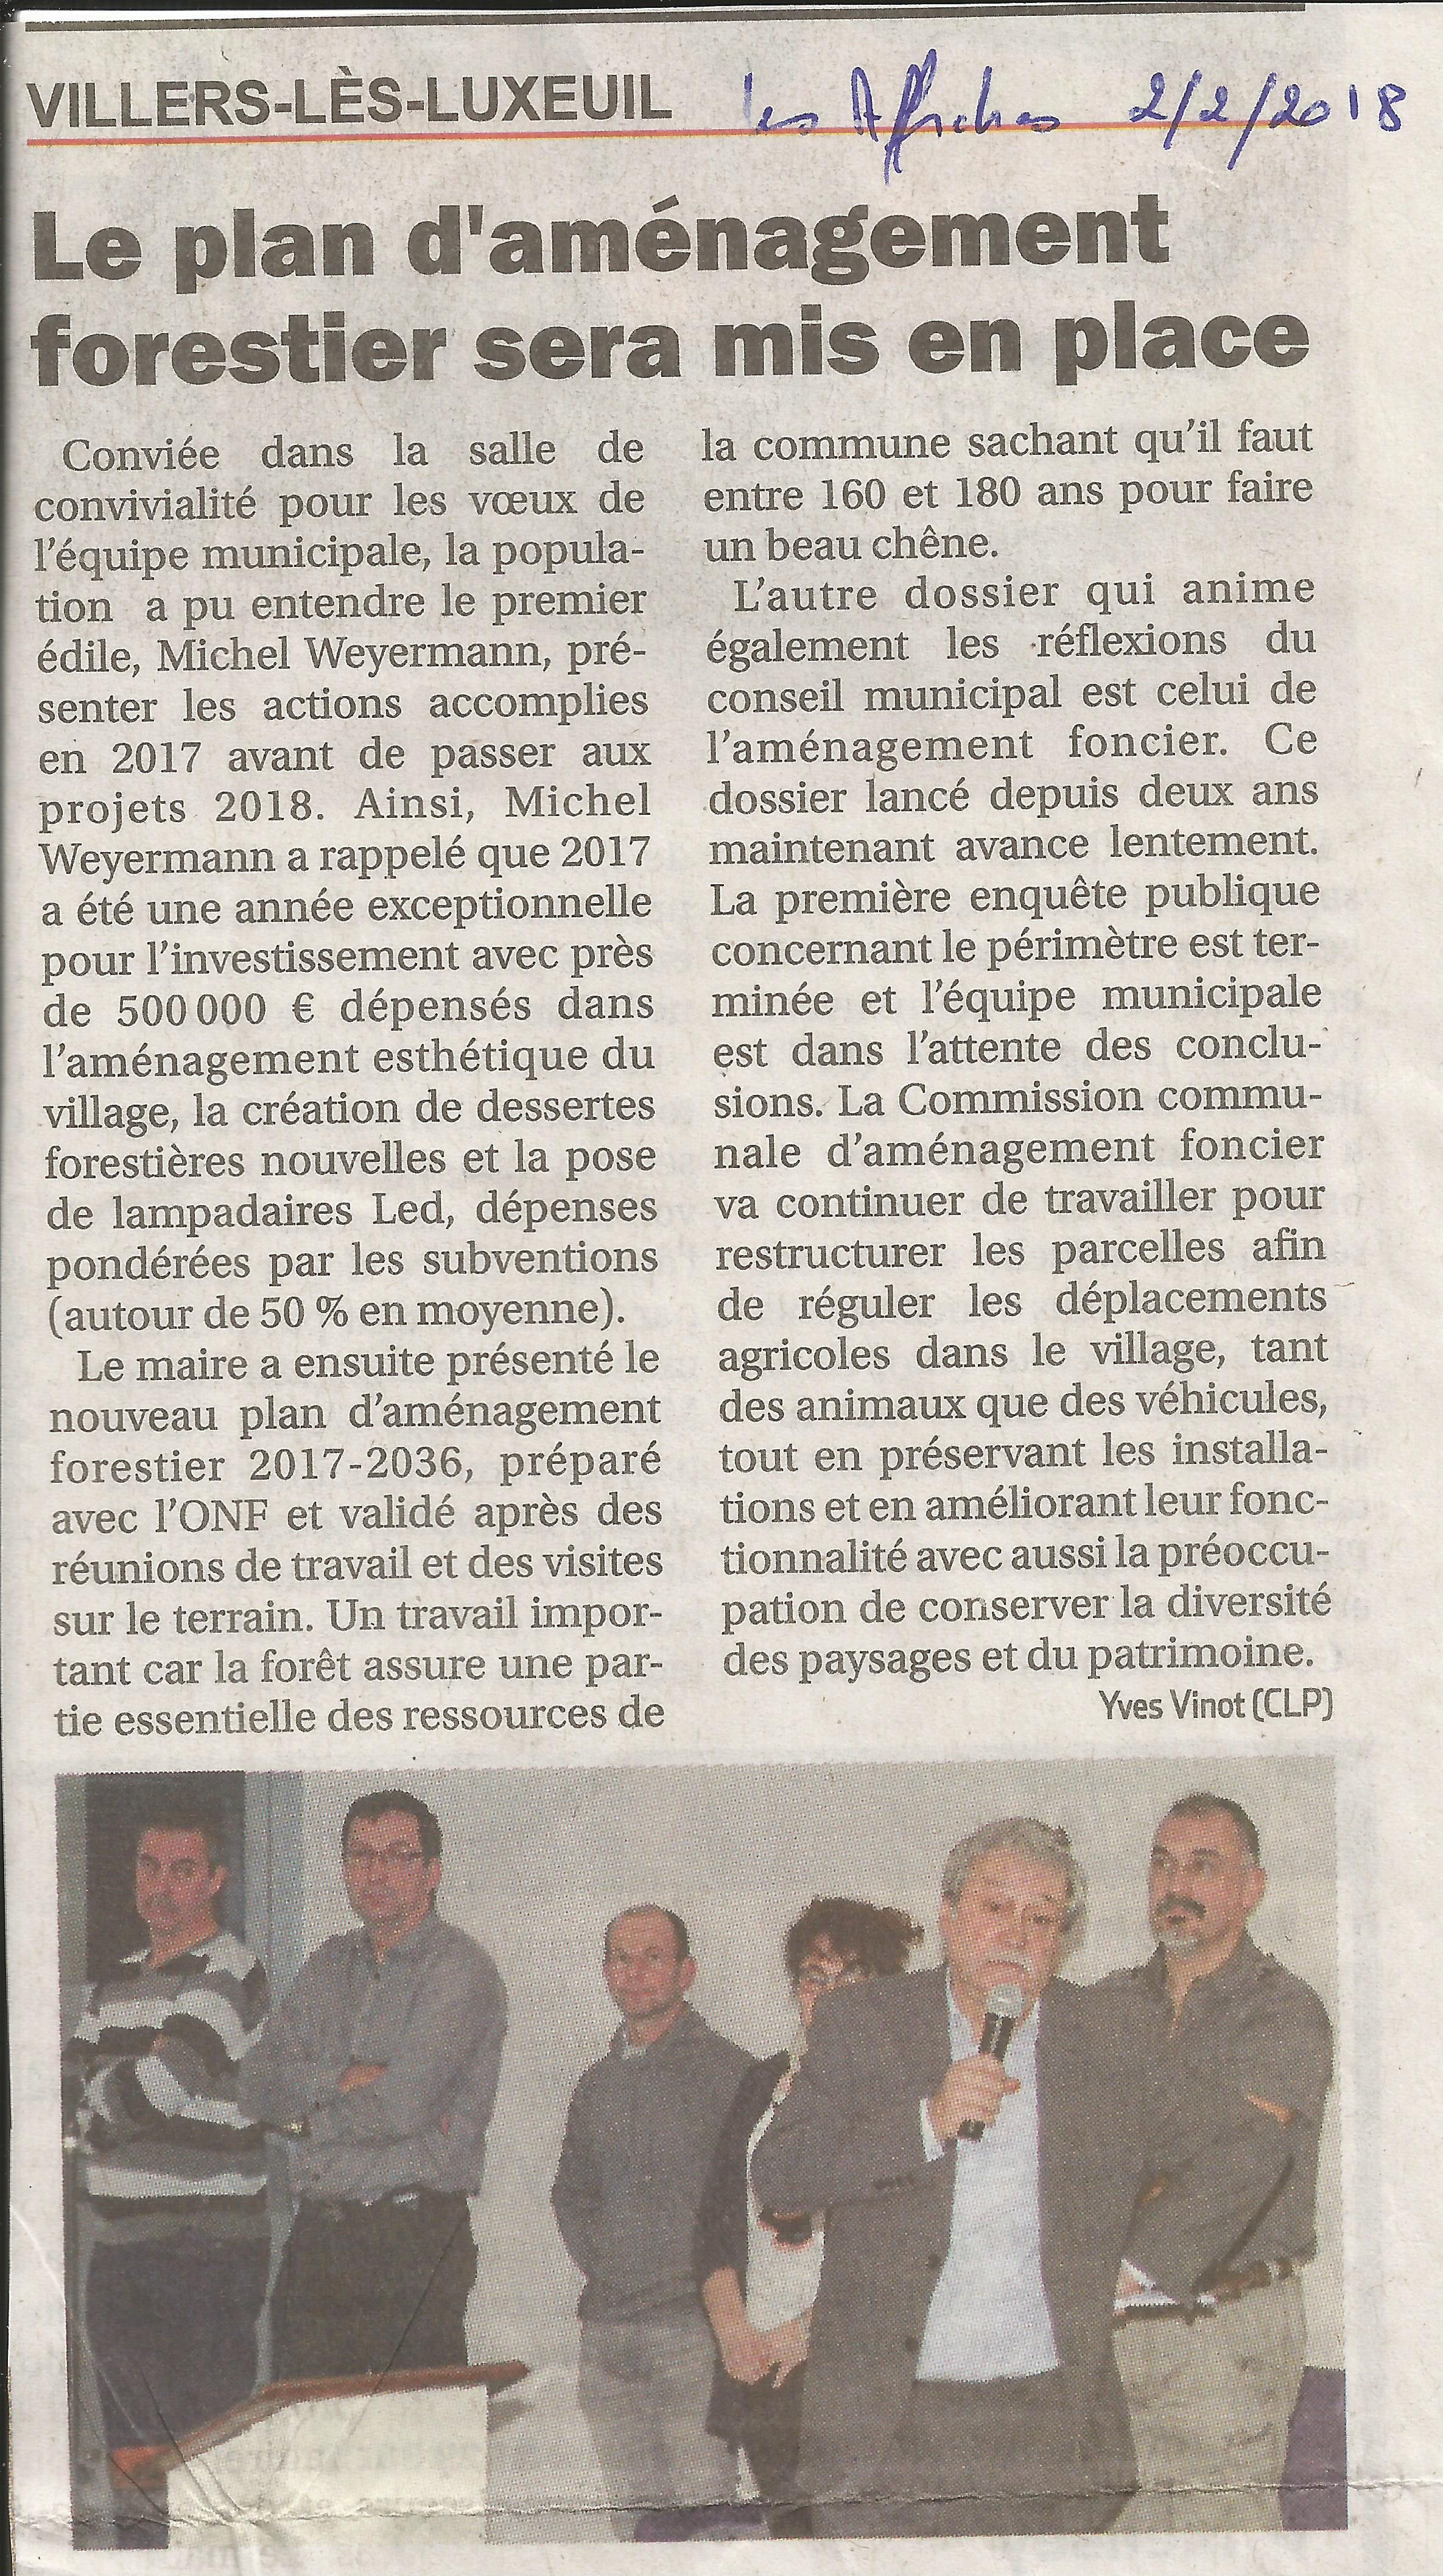 https://www.villers-les-luxeuil.com/projets/villers/files/images/2018_Mairie/Presse/2018_02_02.jpg